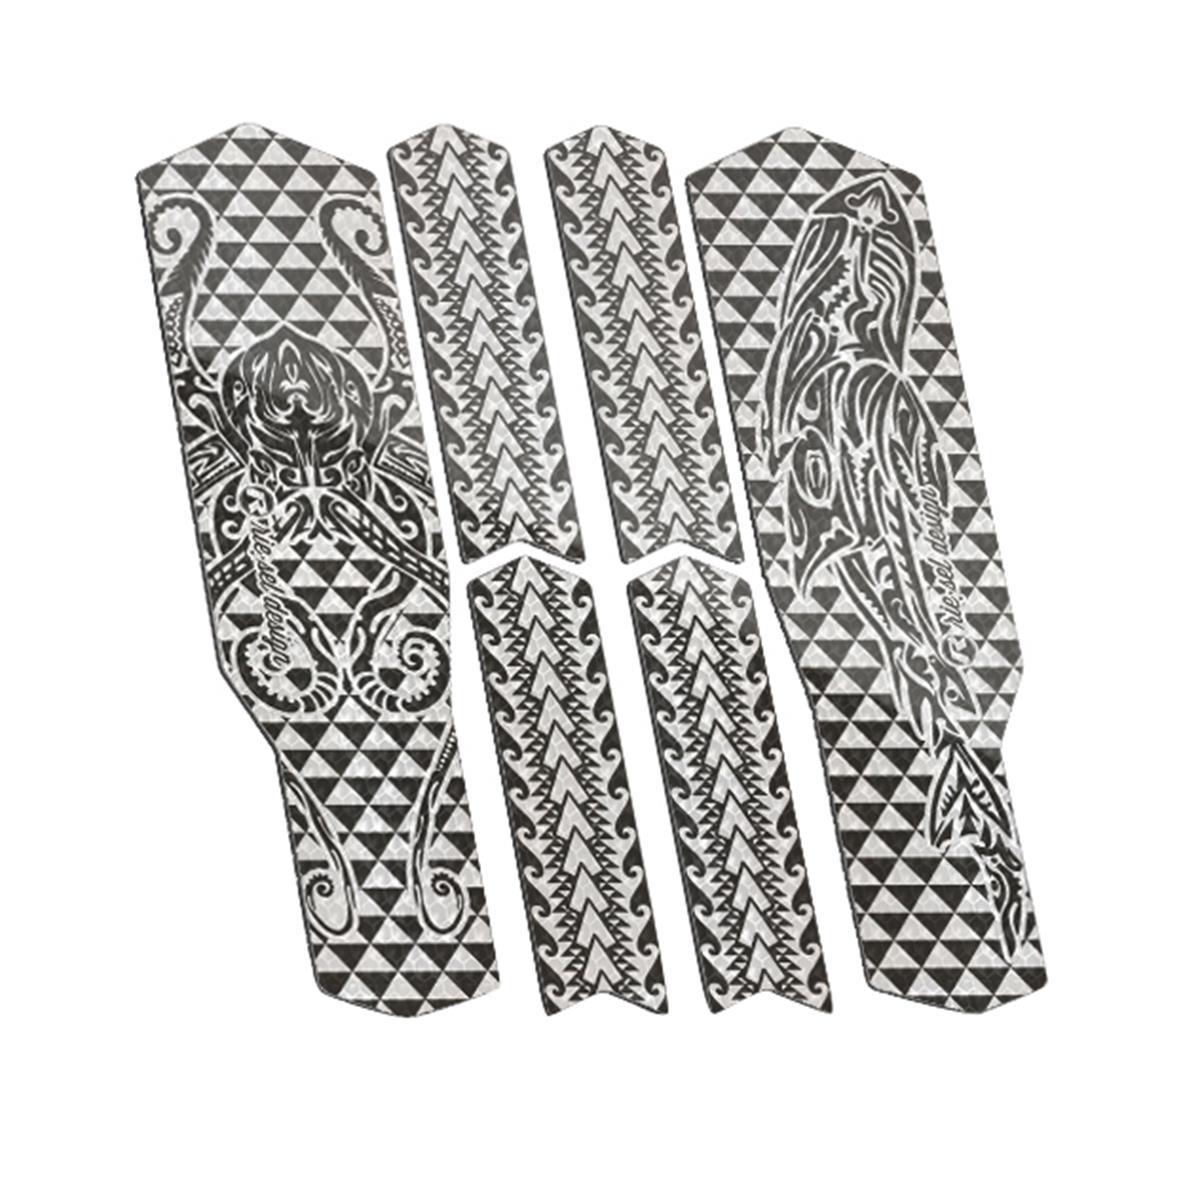 Riesel Design Kettenstrebenschutz Tape 3000 Maori